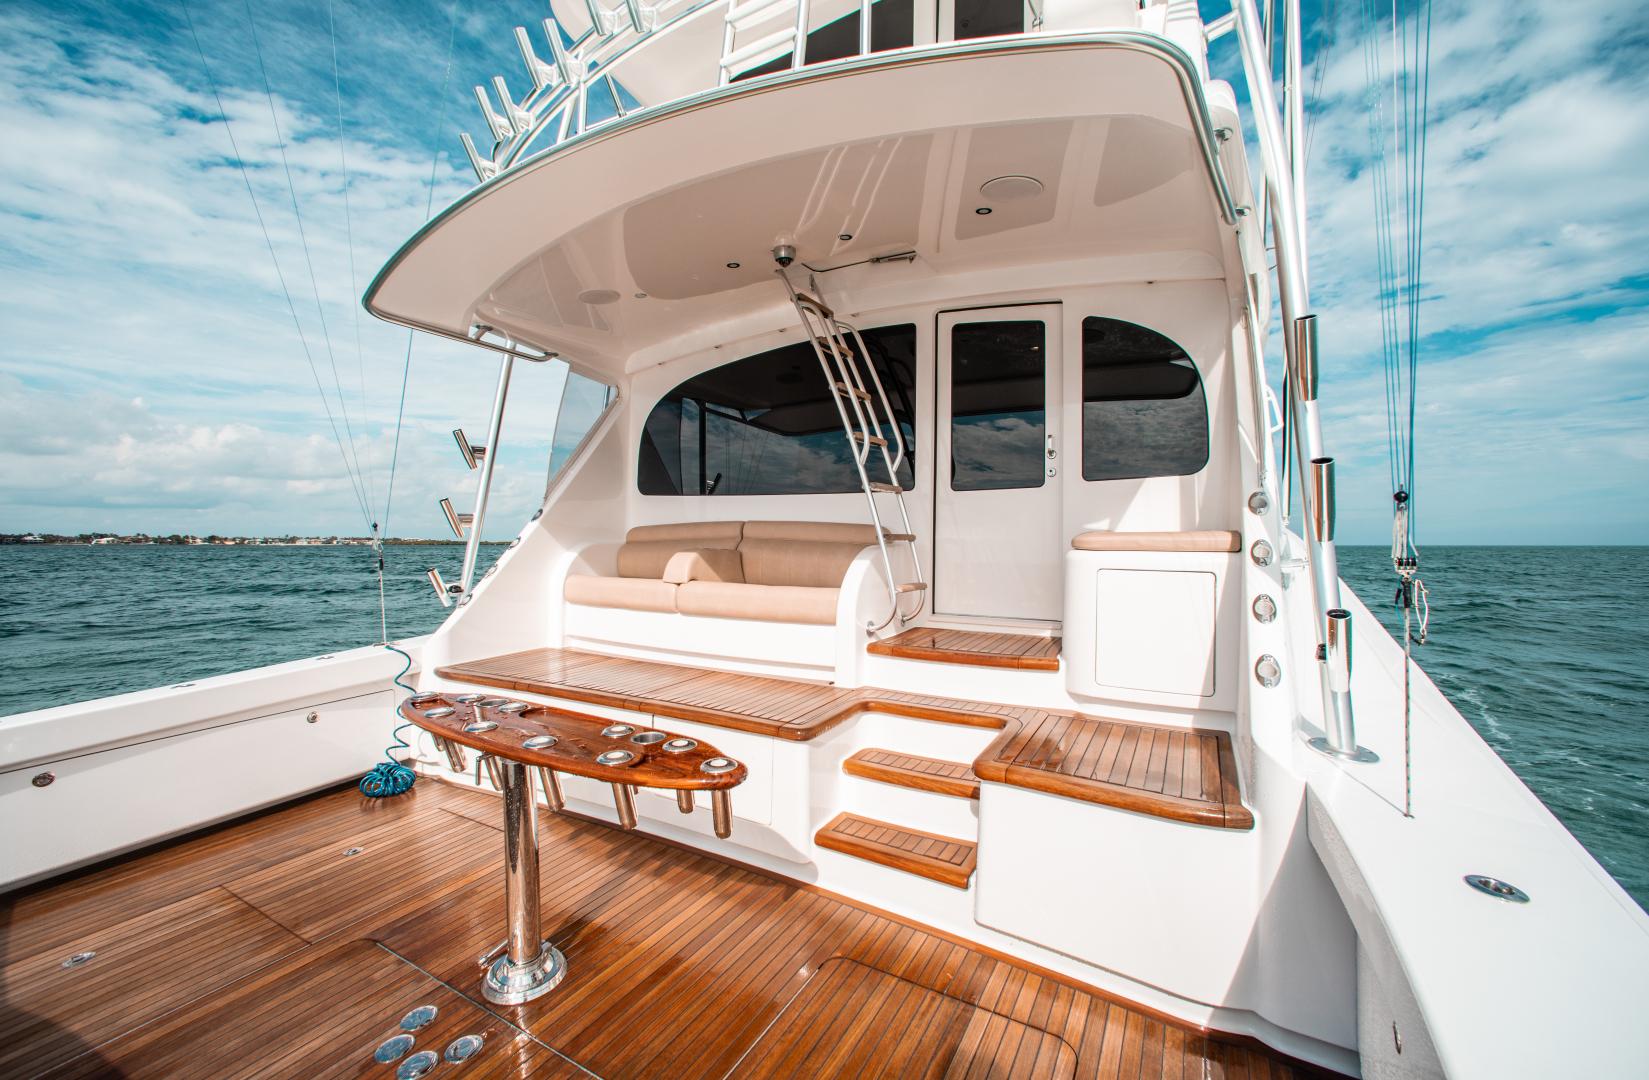 Viking-72 Enclosed Bridge 2018-Red Lion Ocean Reef-Florida-United States-2018 Viking 72 Enclosed Bridge  Red Lion  Cockpit-1568246   Thumbnail